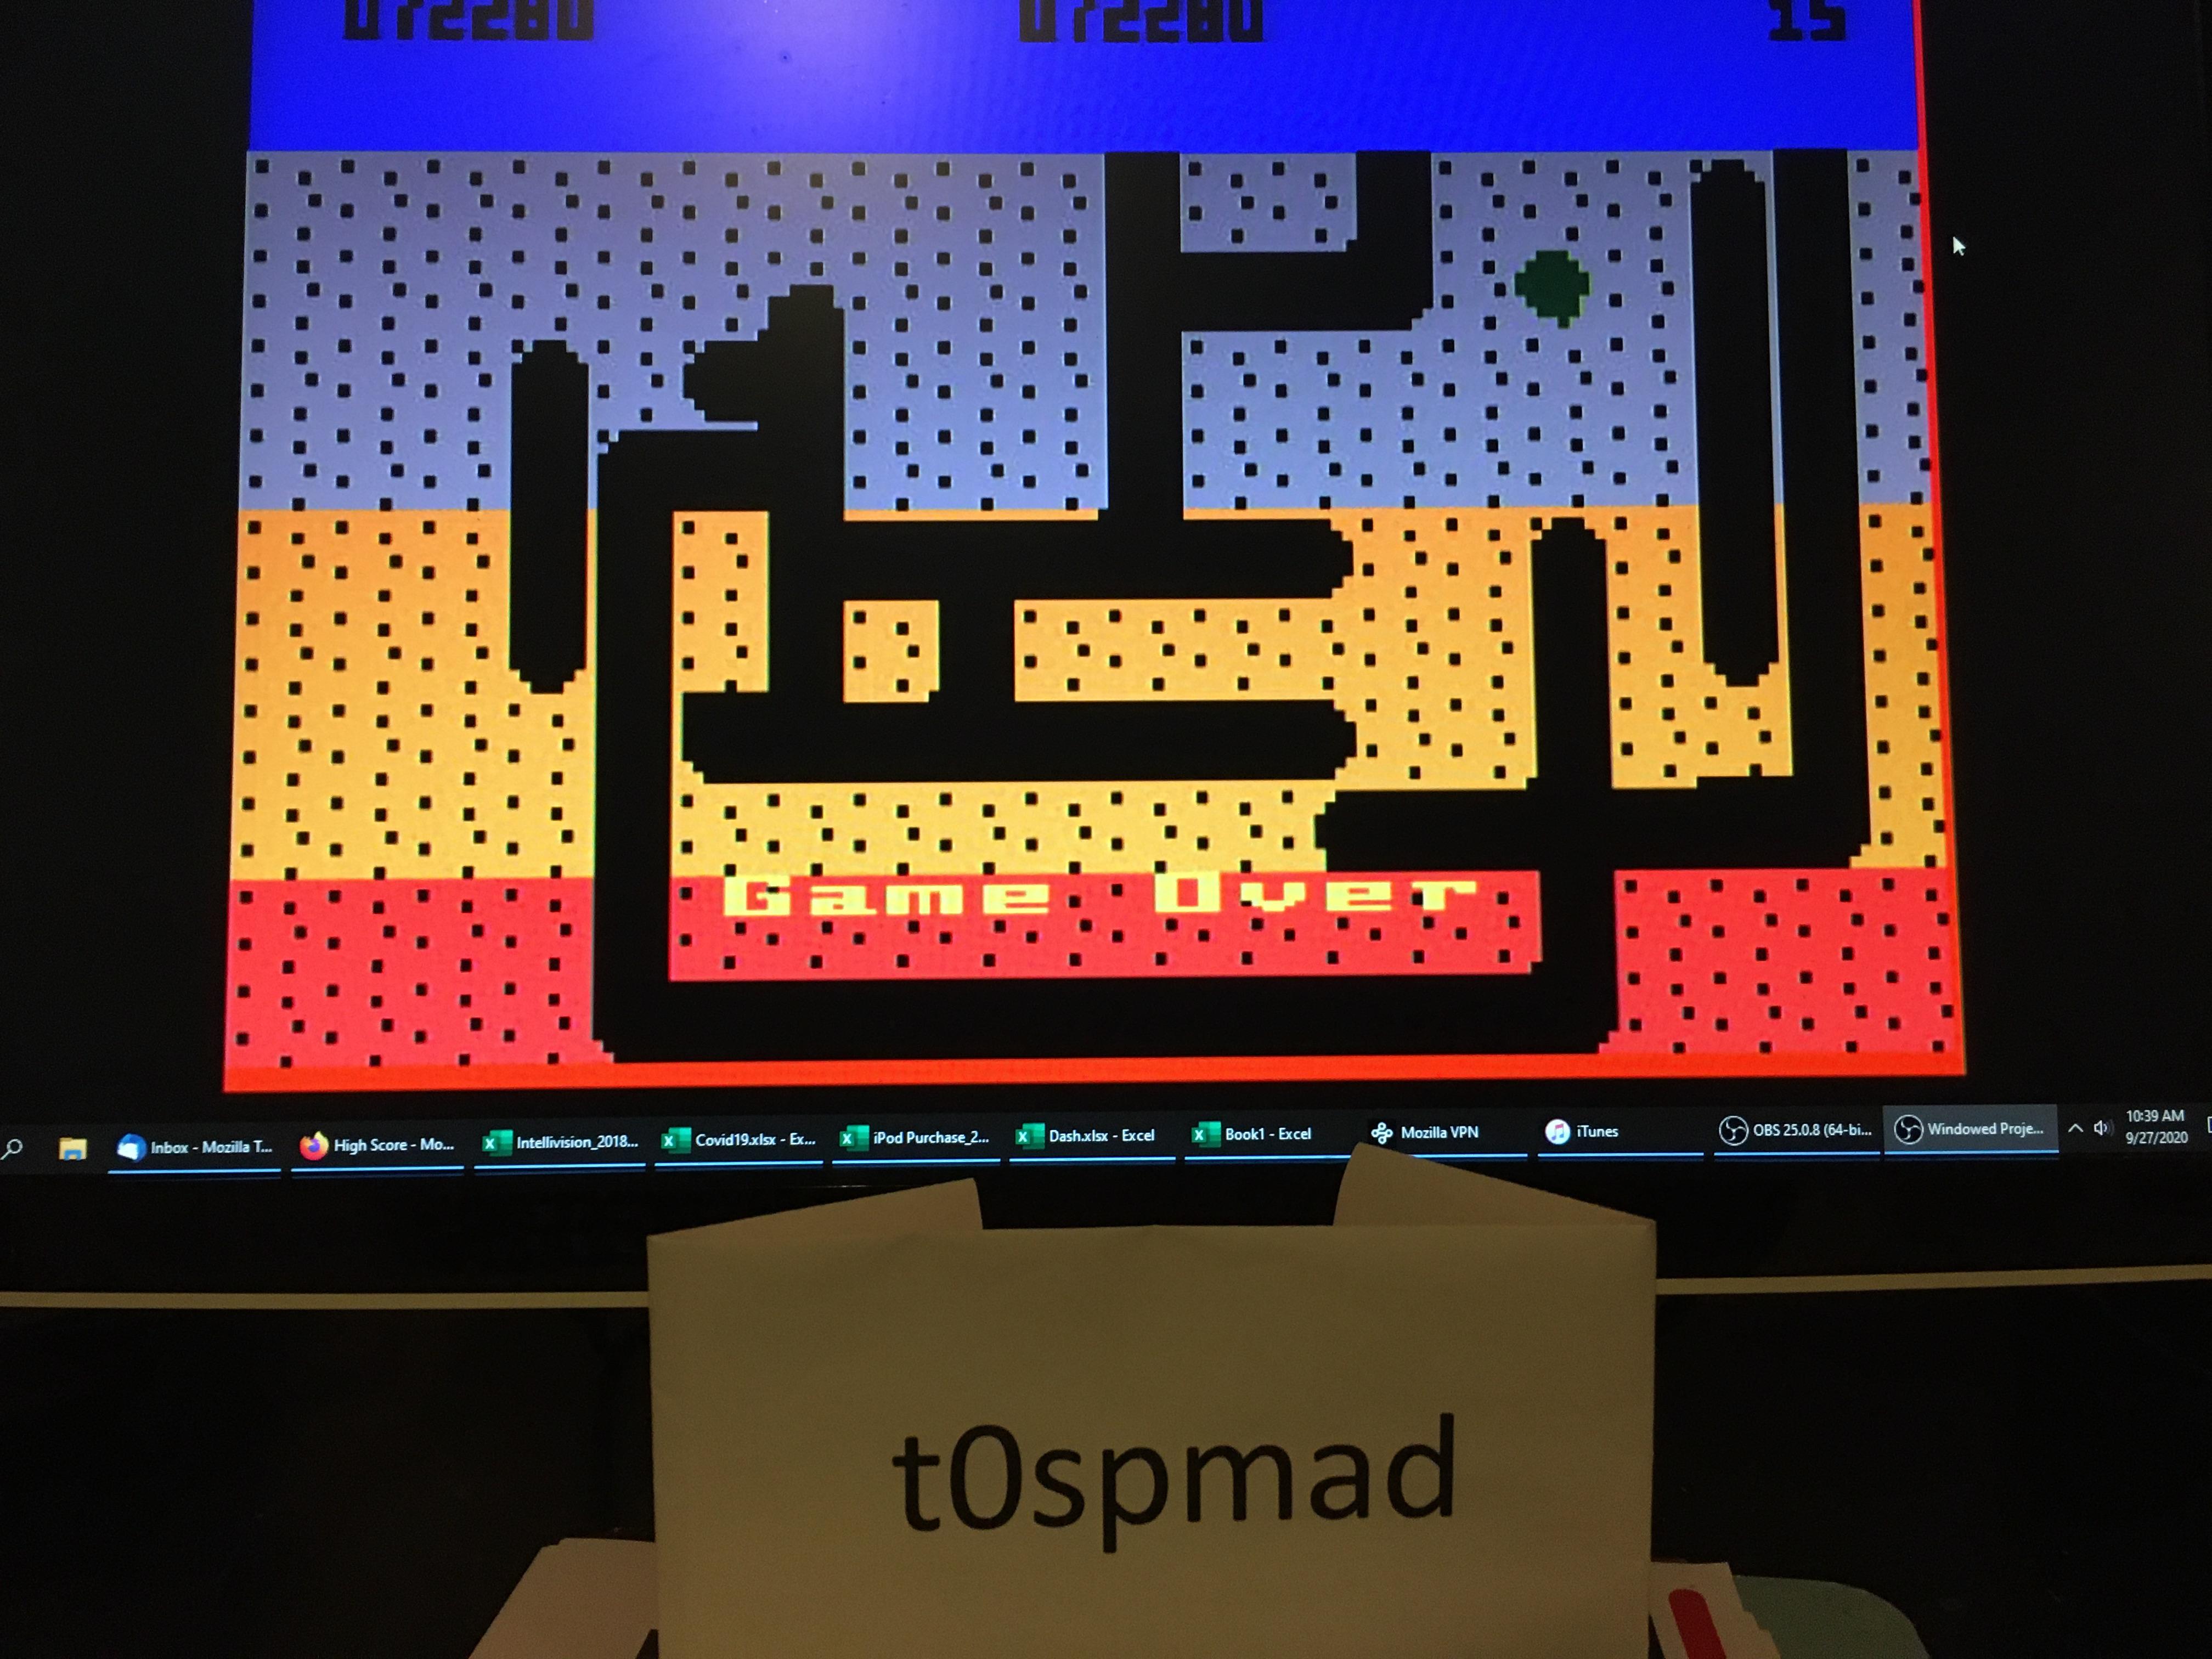 t0spmad: Dig Dug (Intellivision Emulated) 72,280 points on 2020-09-27 10:51:21